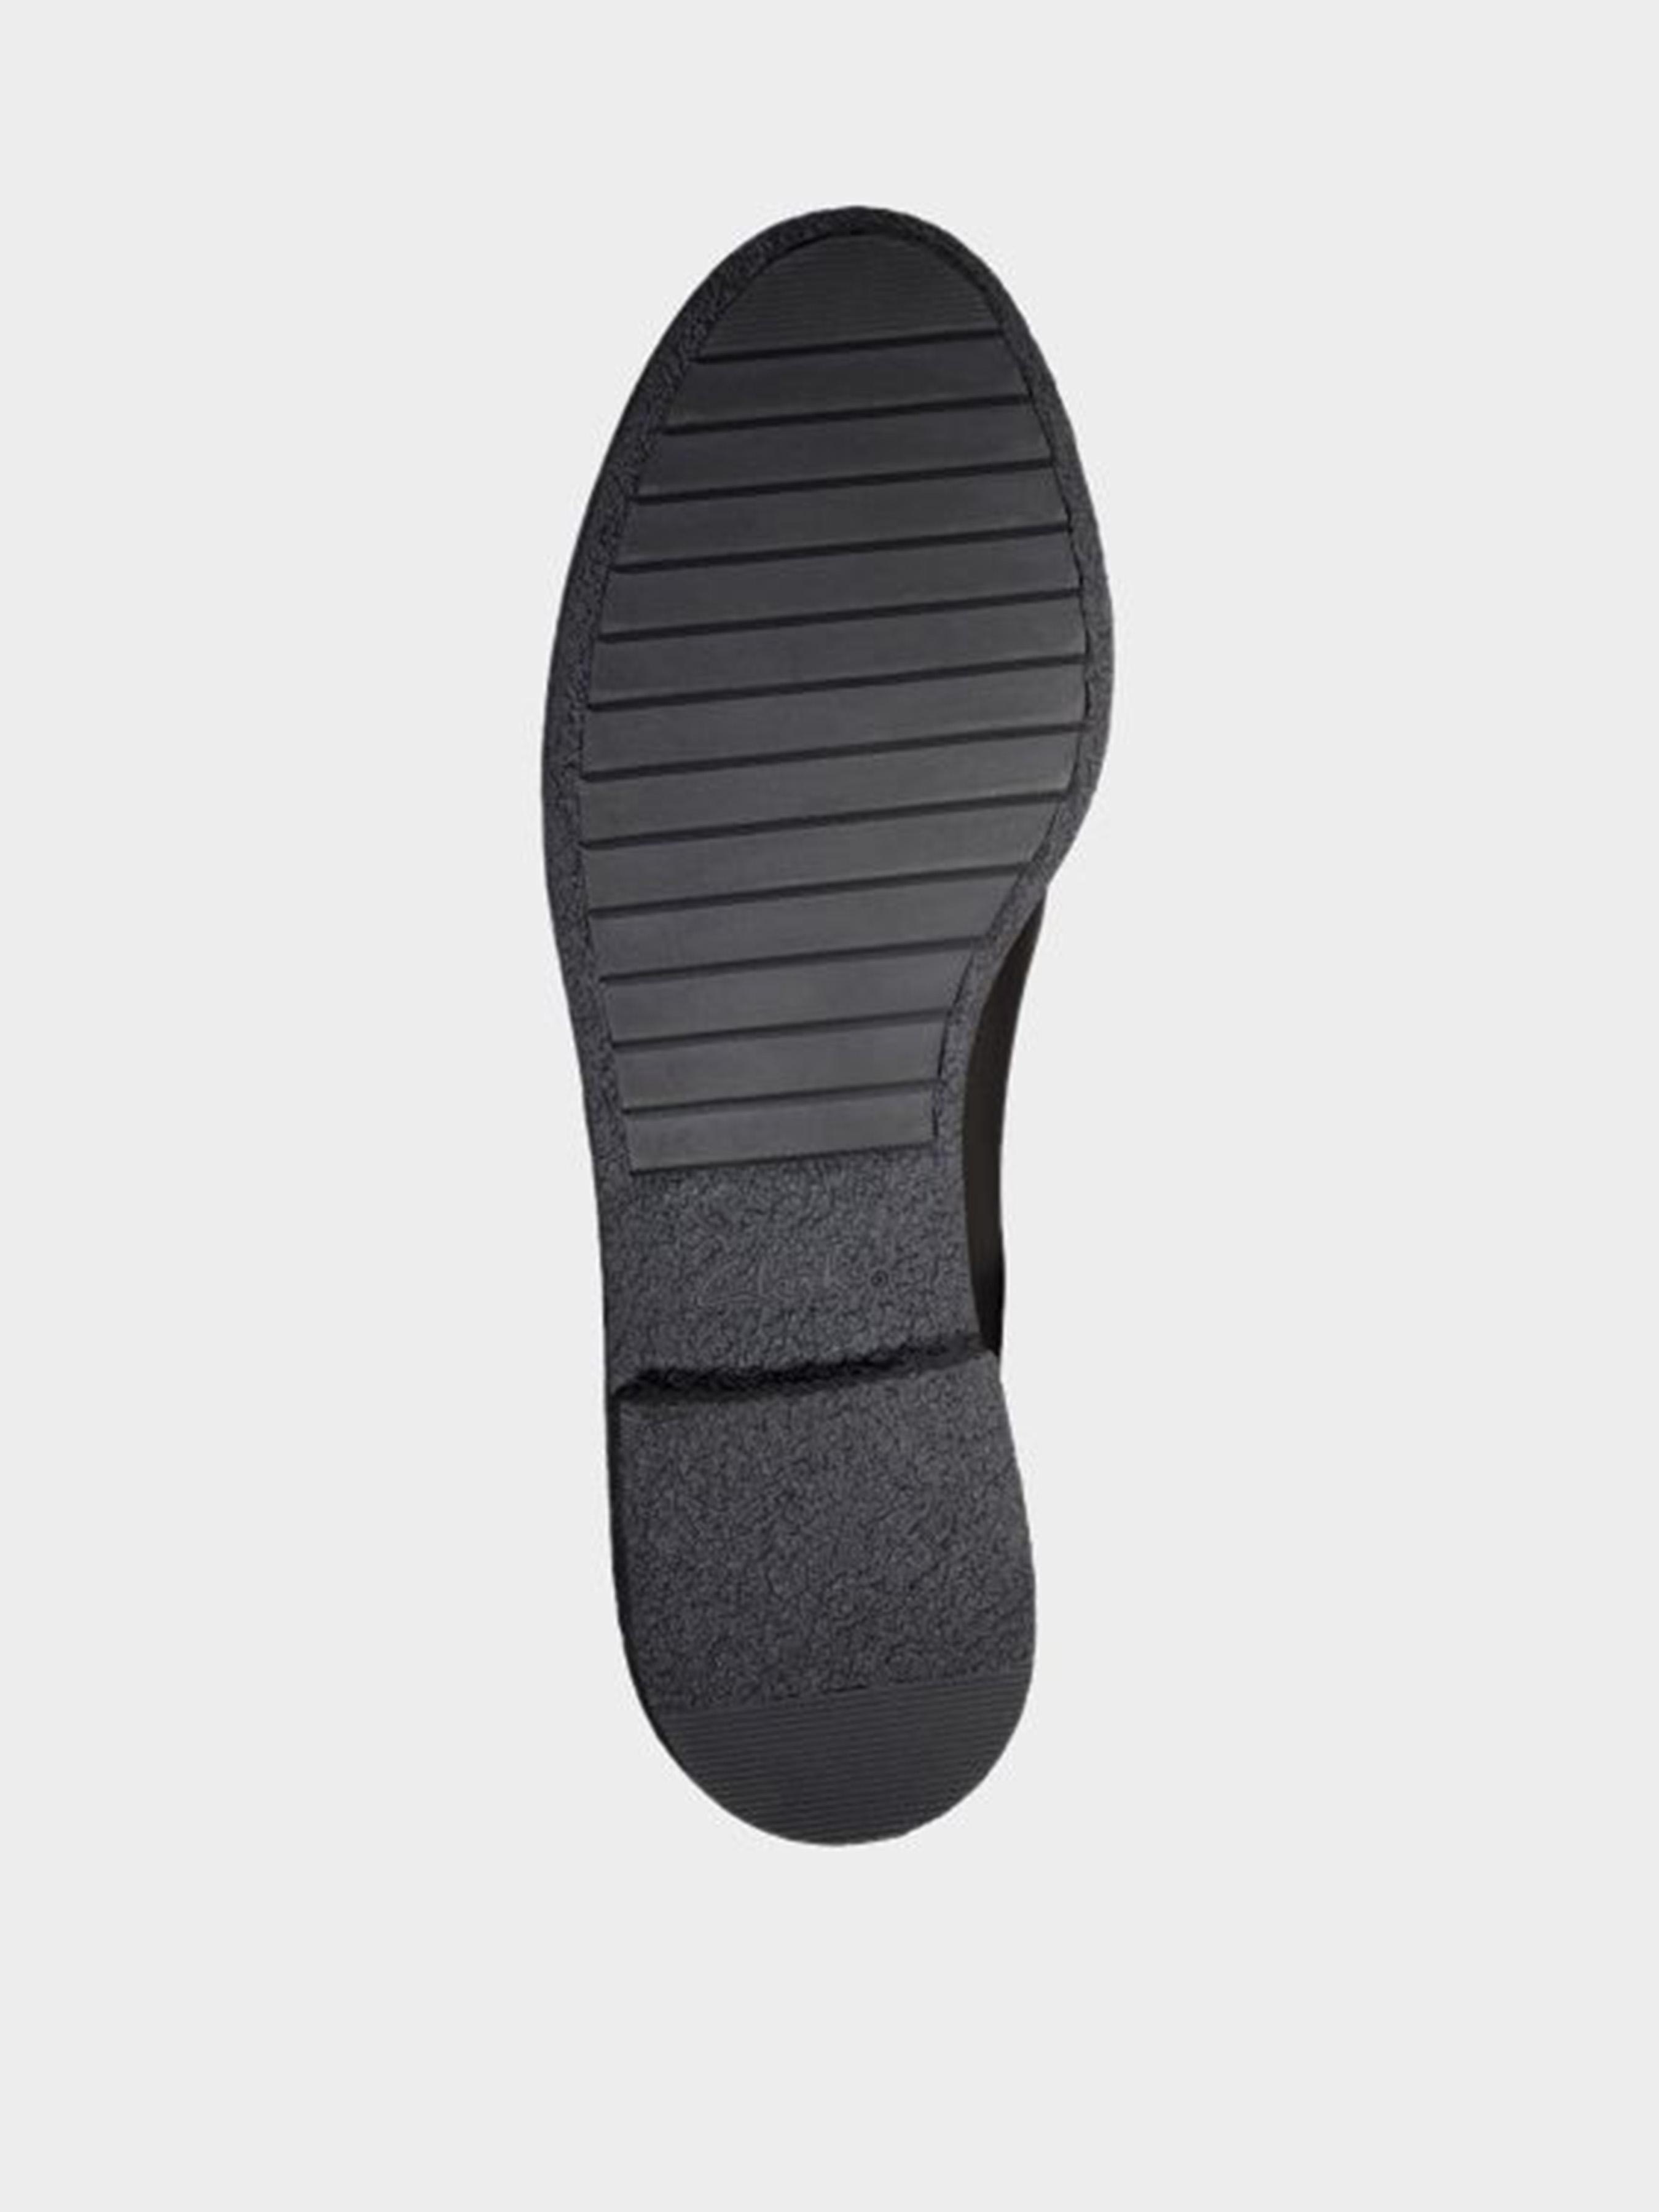 Ботинки для женщин Clarks Griffin Plaza OW4474 продажа, 2017